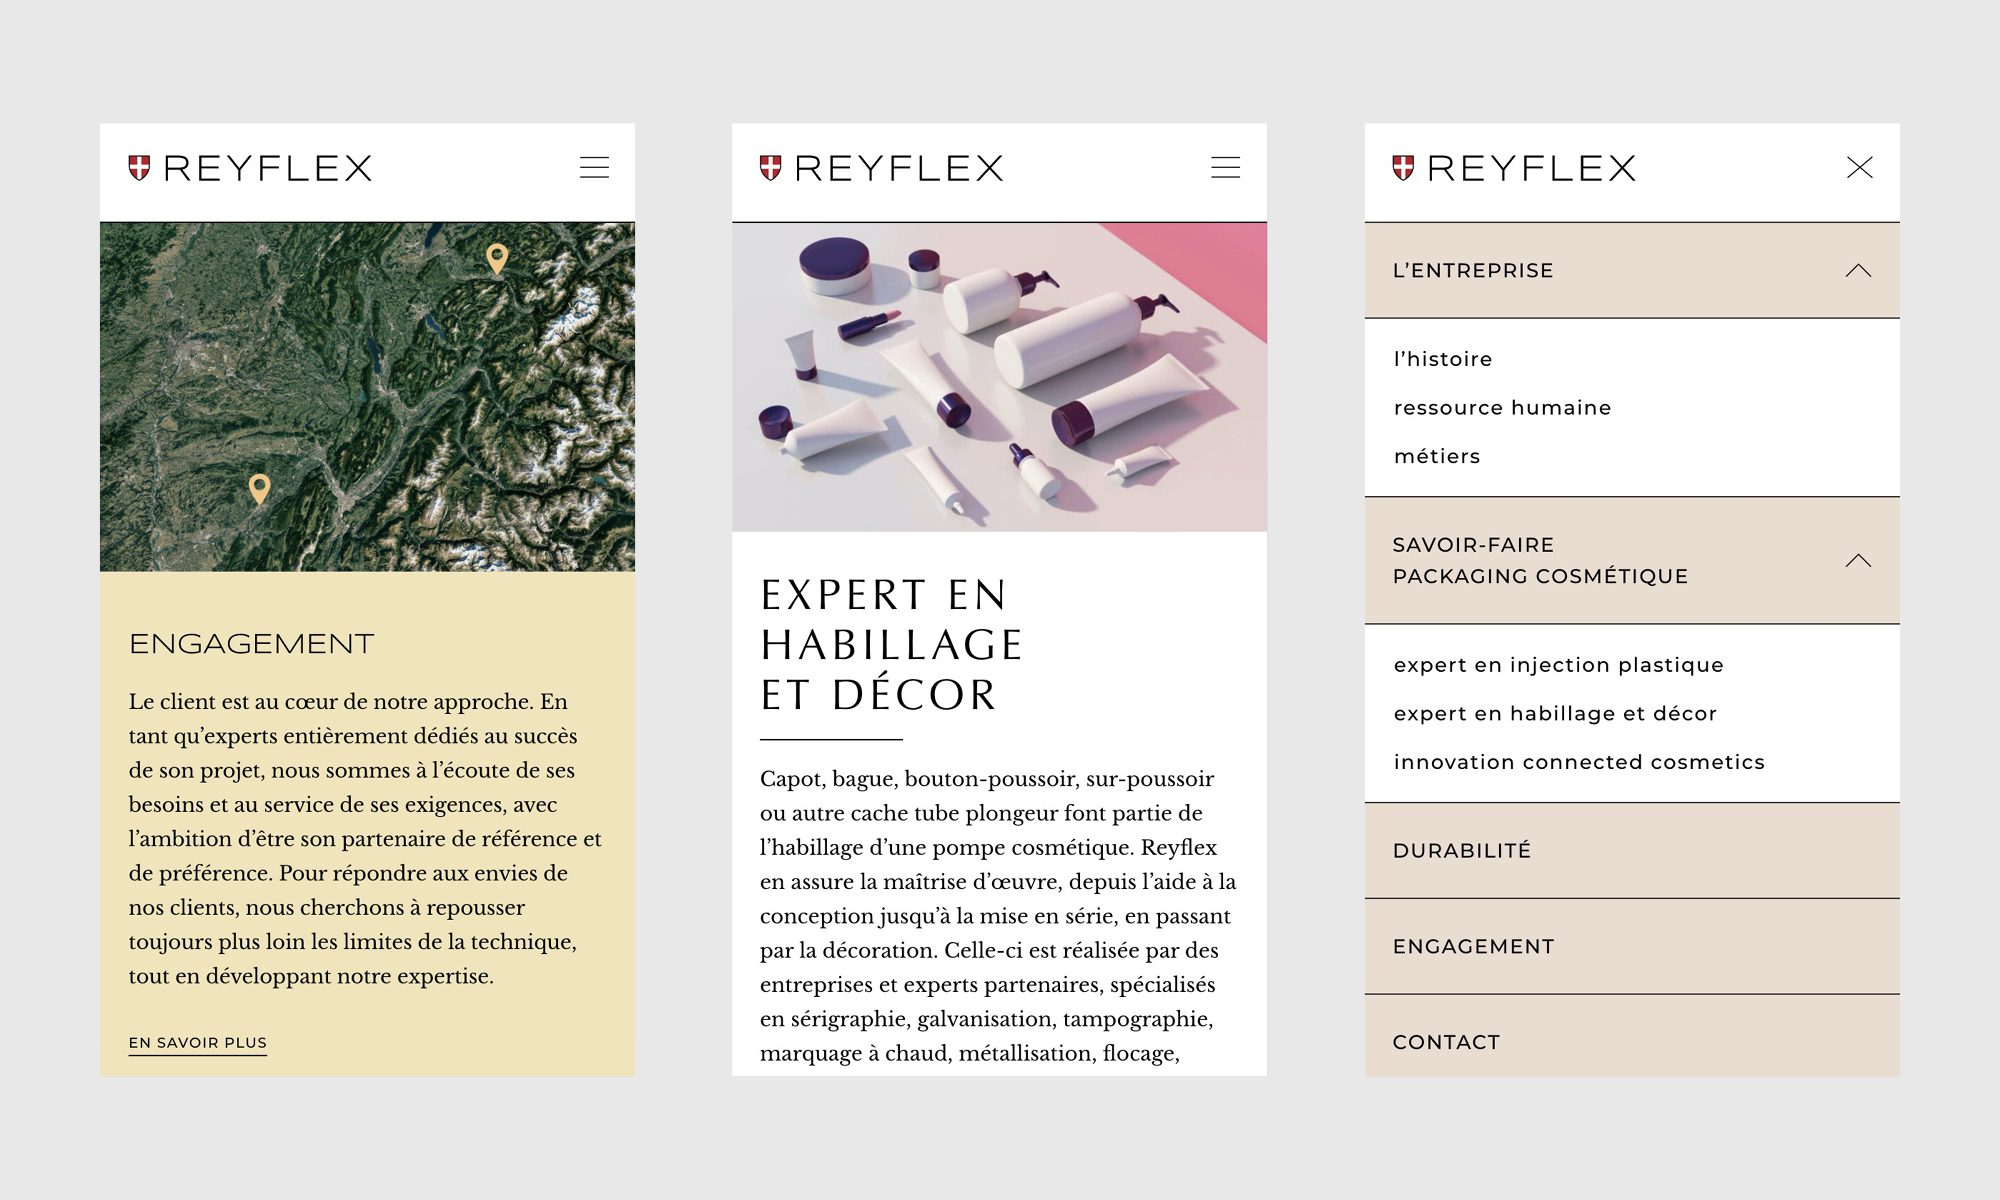 Le sitze Reyflex en version mobile, design responsive IchetKar